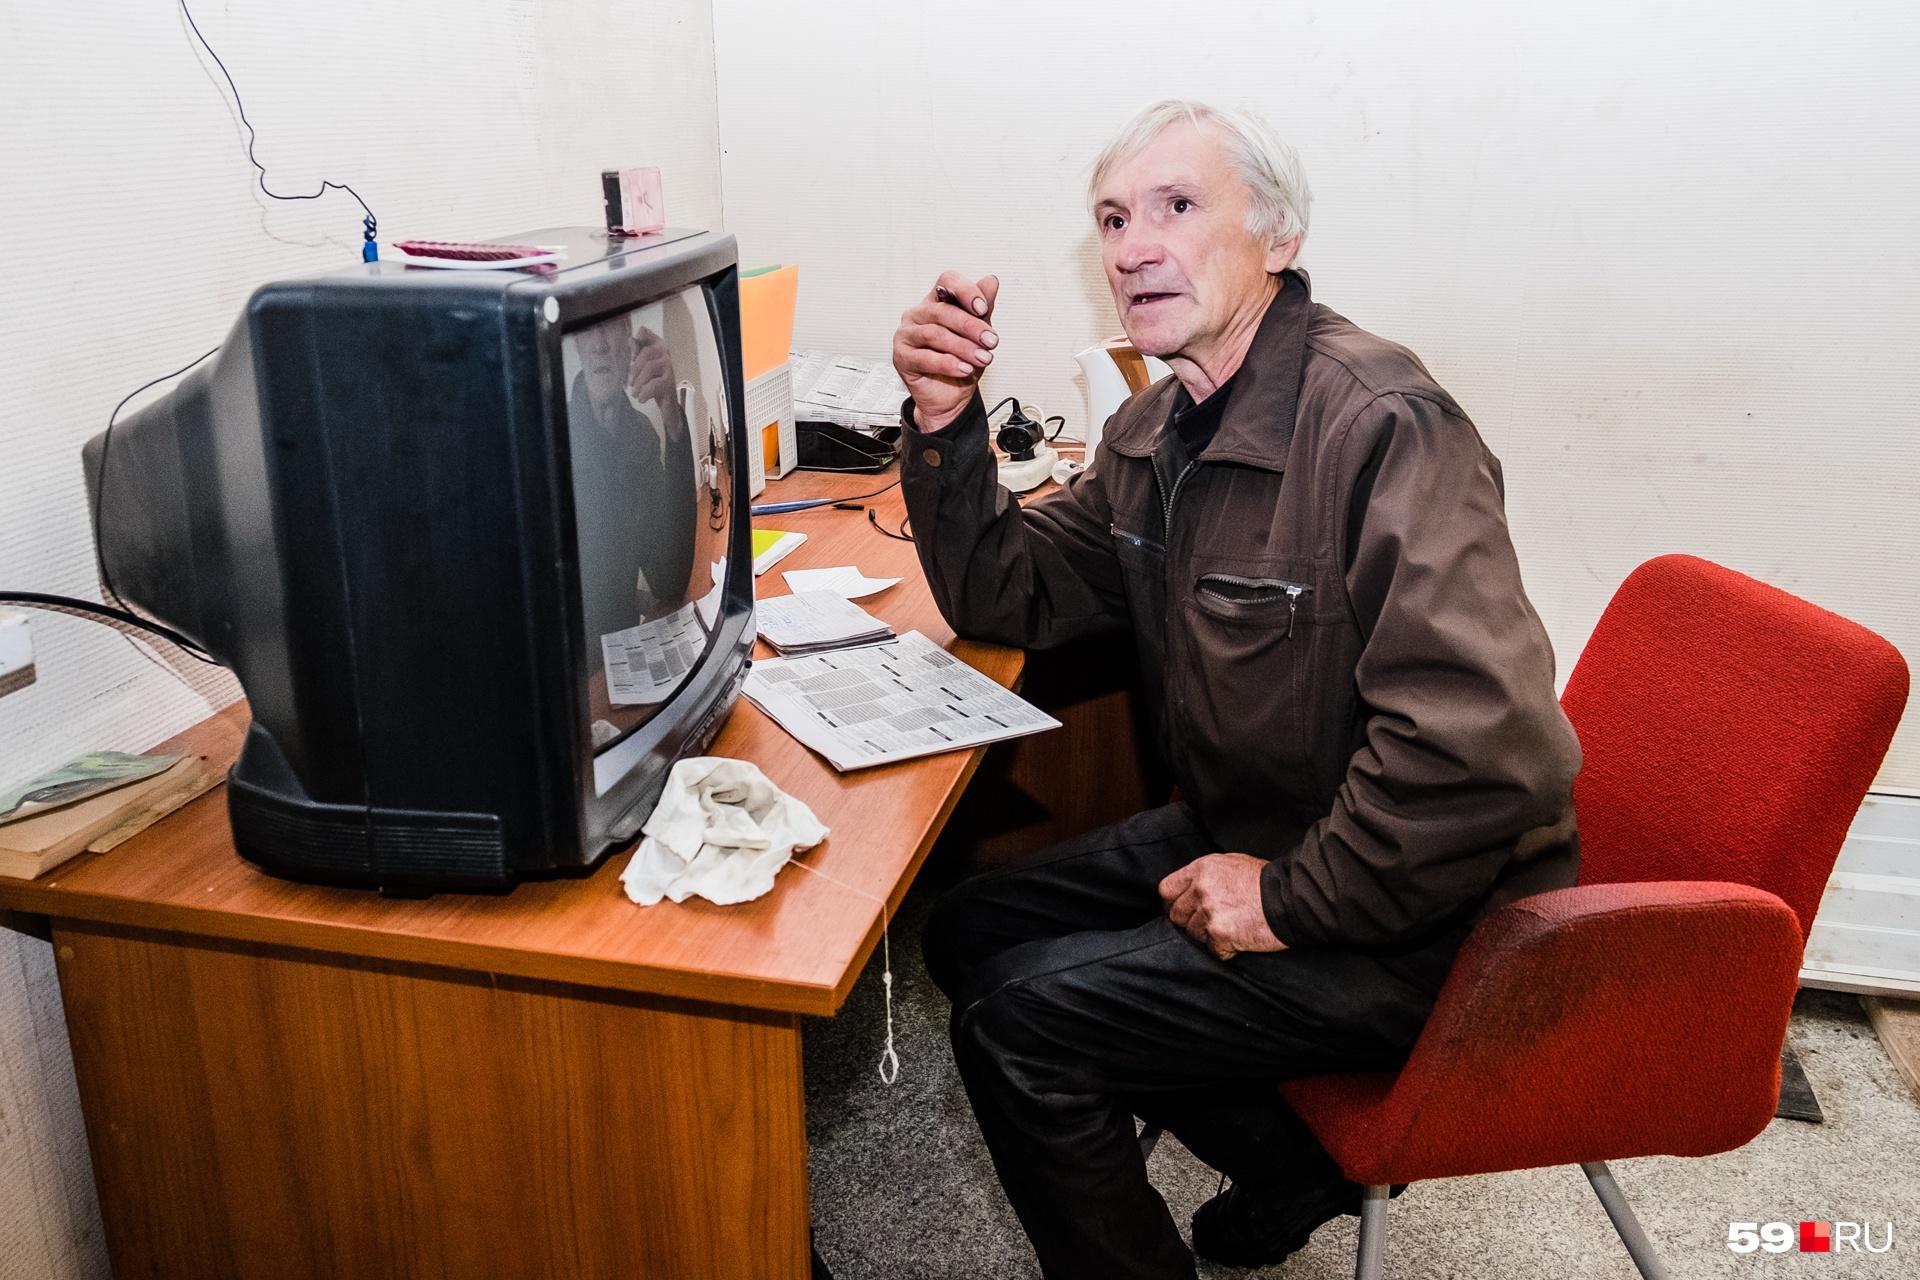 Телевизор Василий Петрович наладил быстро— руки помнят